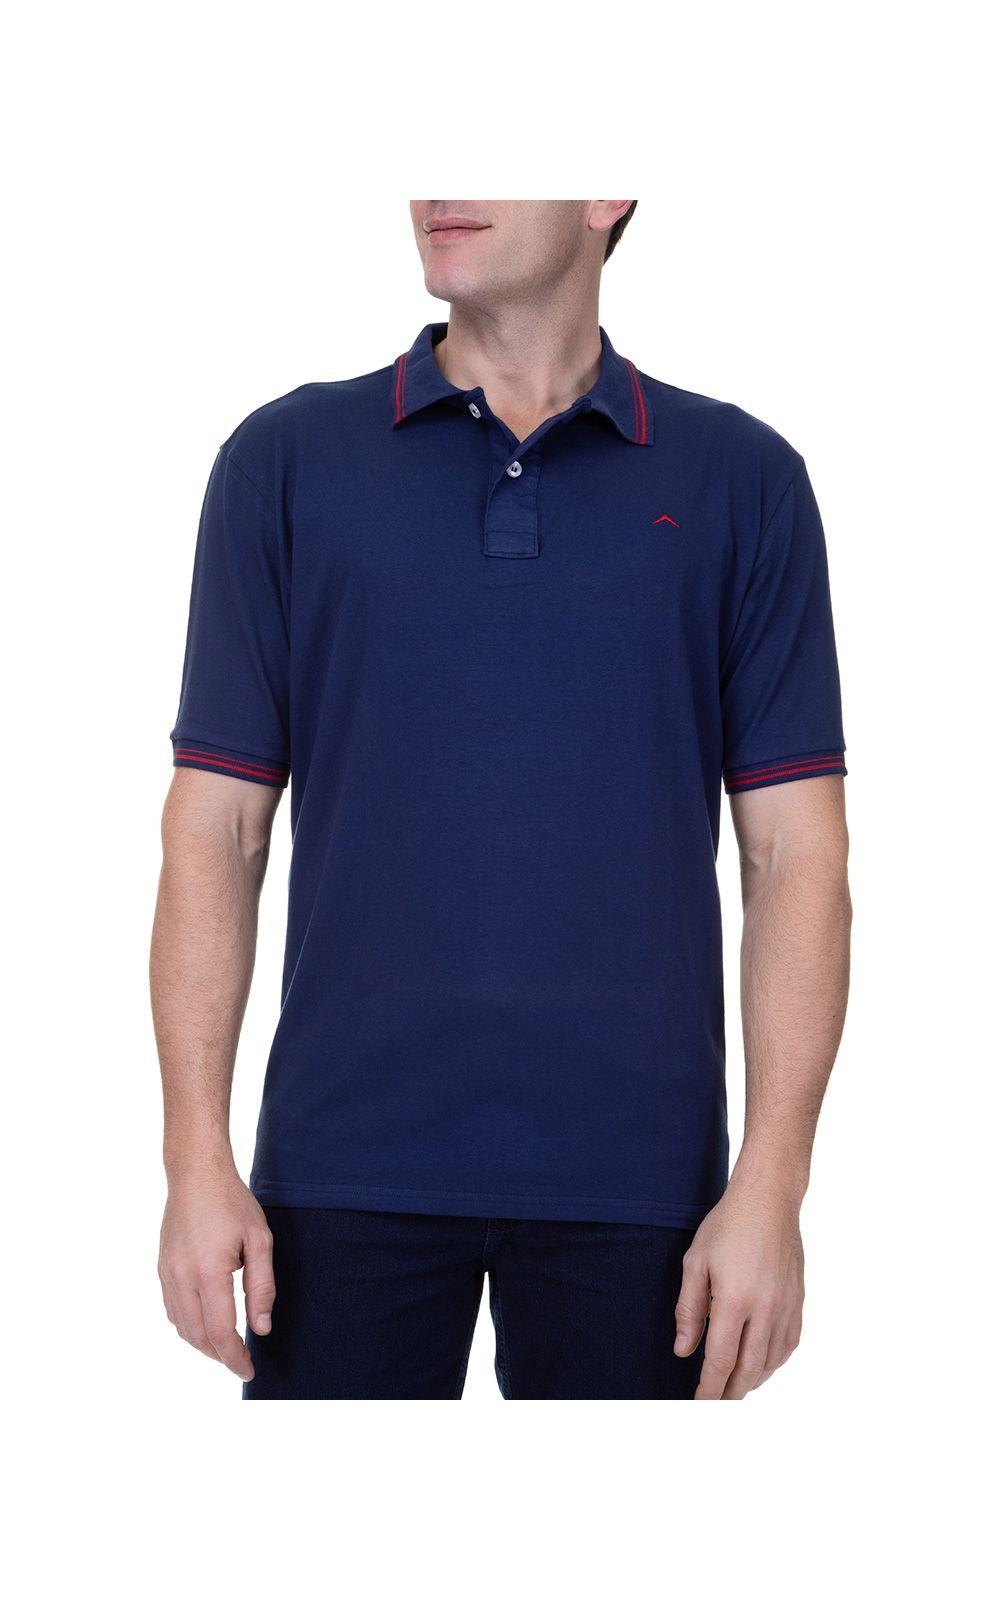 Foto 1 - Camisa Polo Masculina Azul Marinho Detalhada